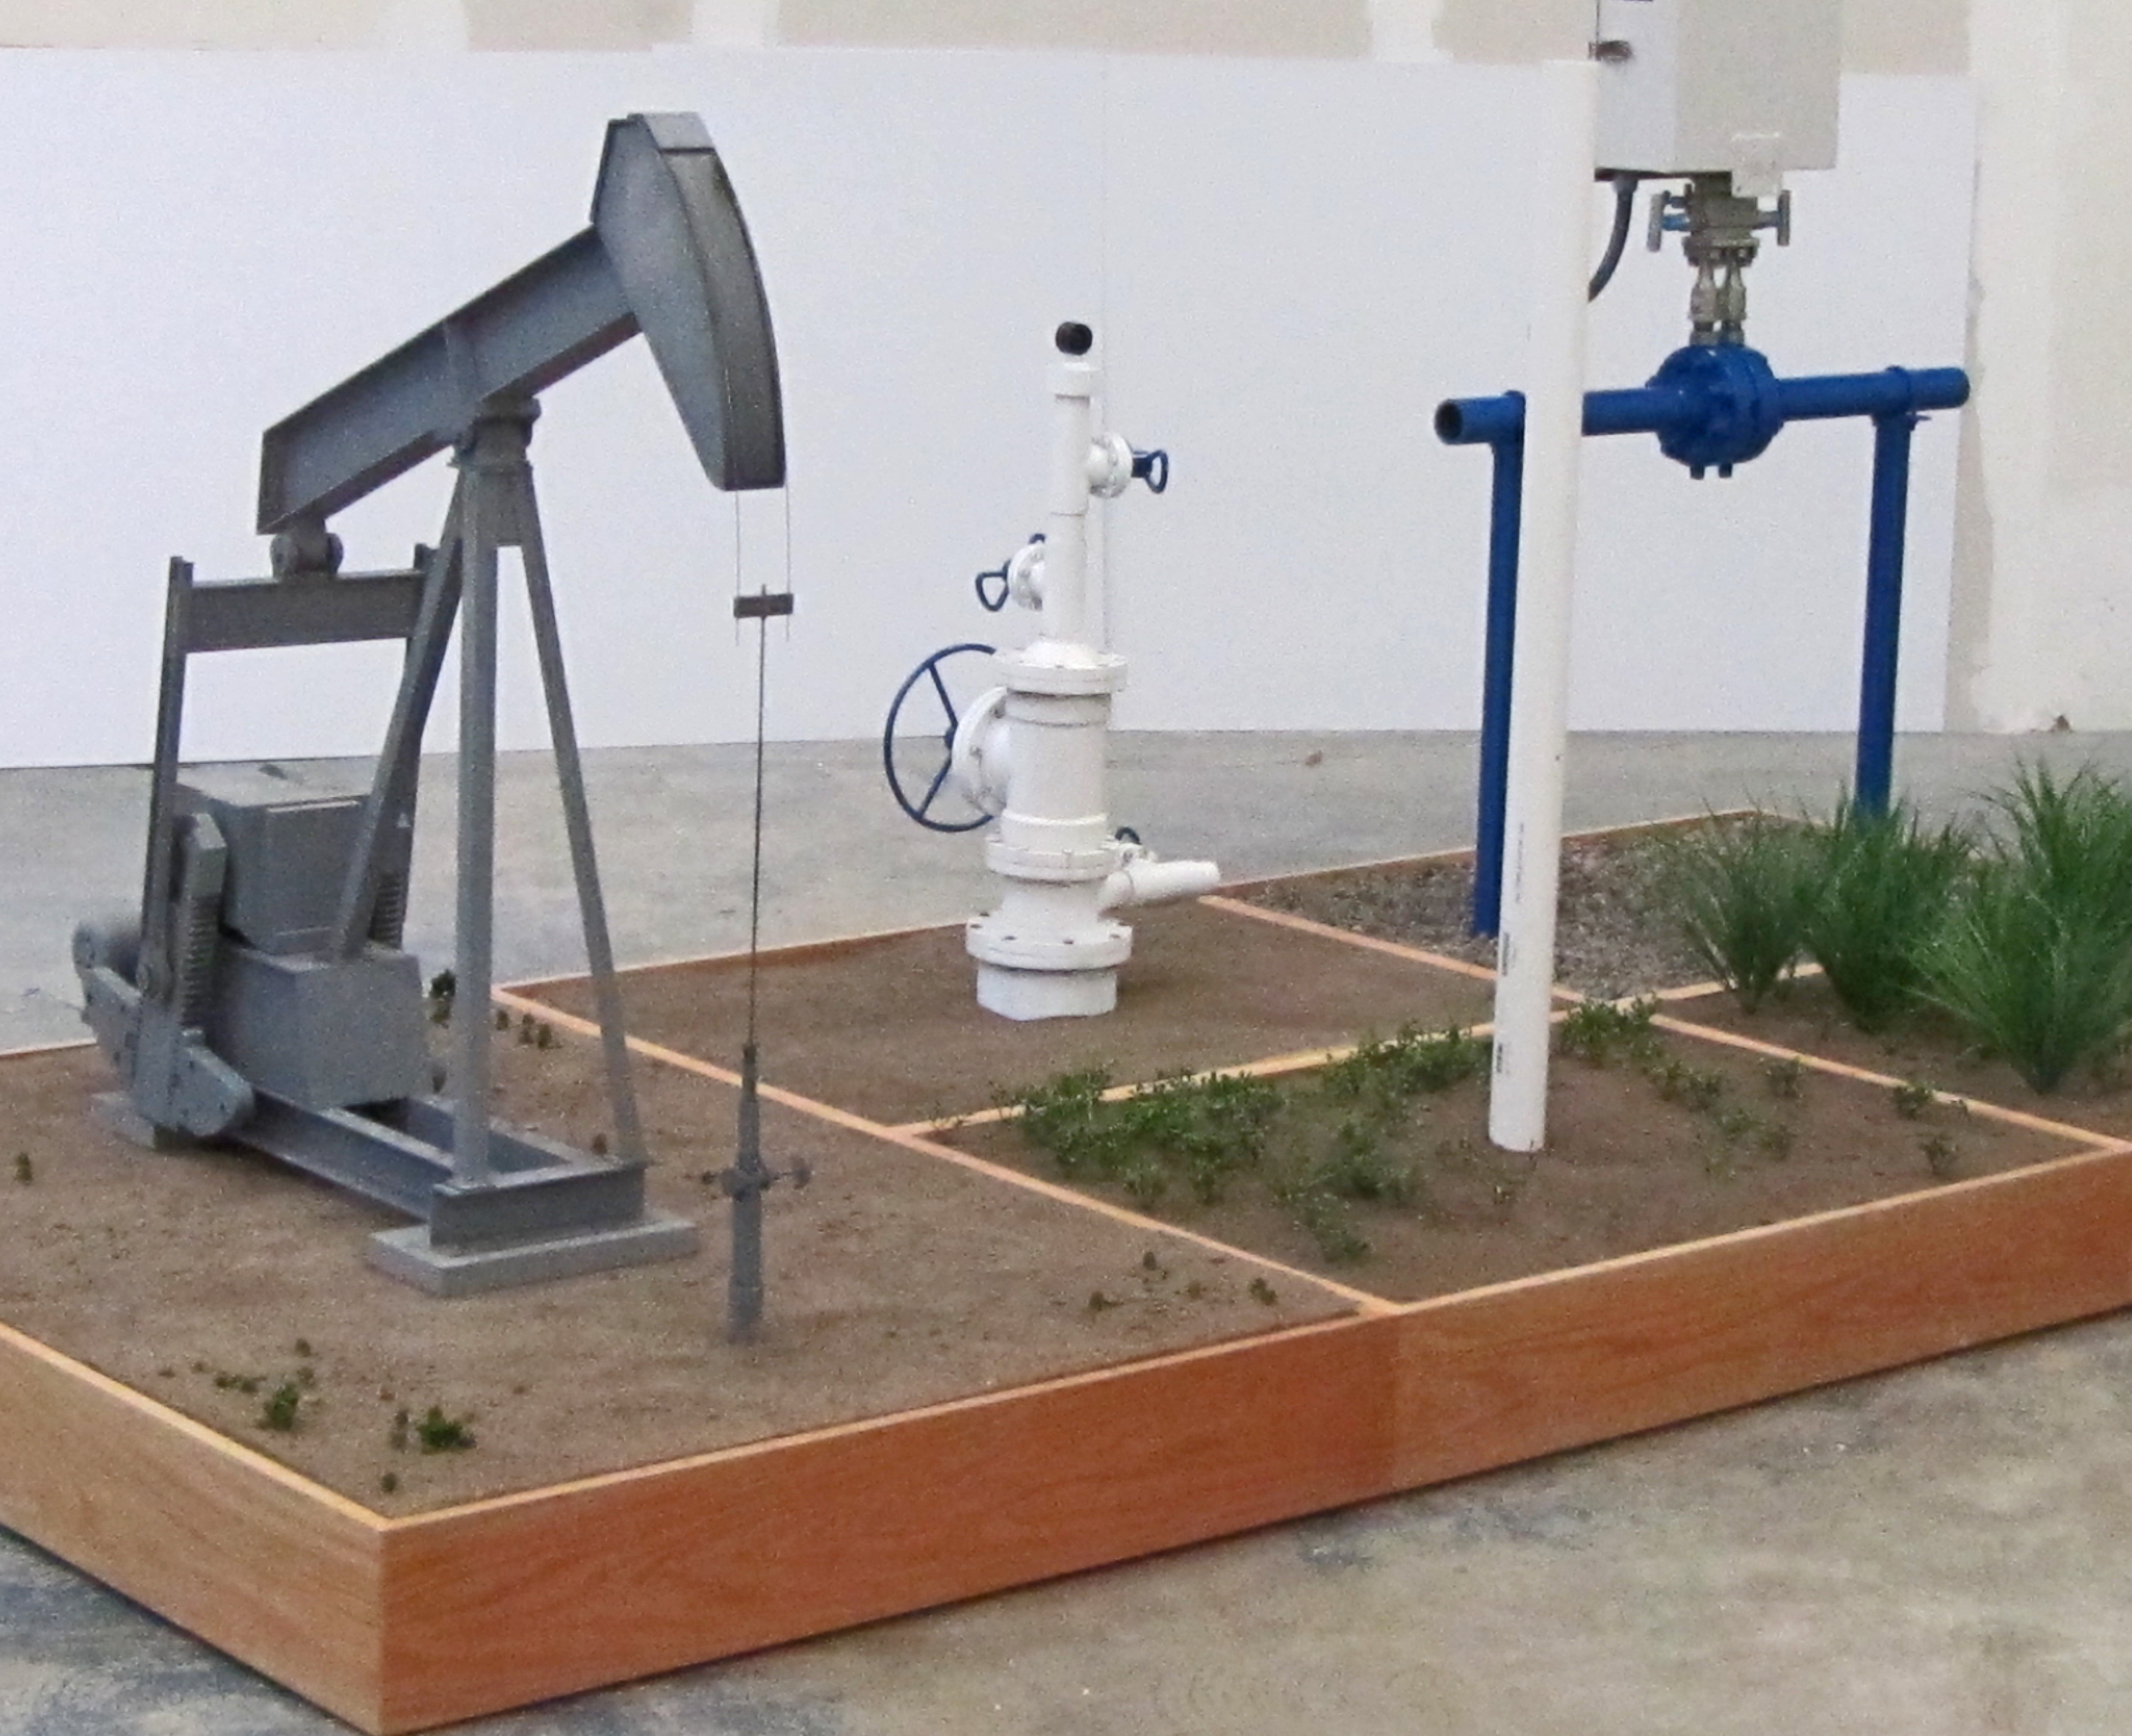 pumpjack model